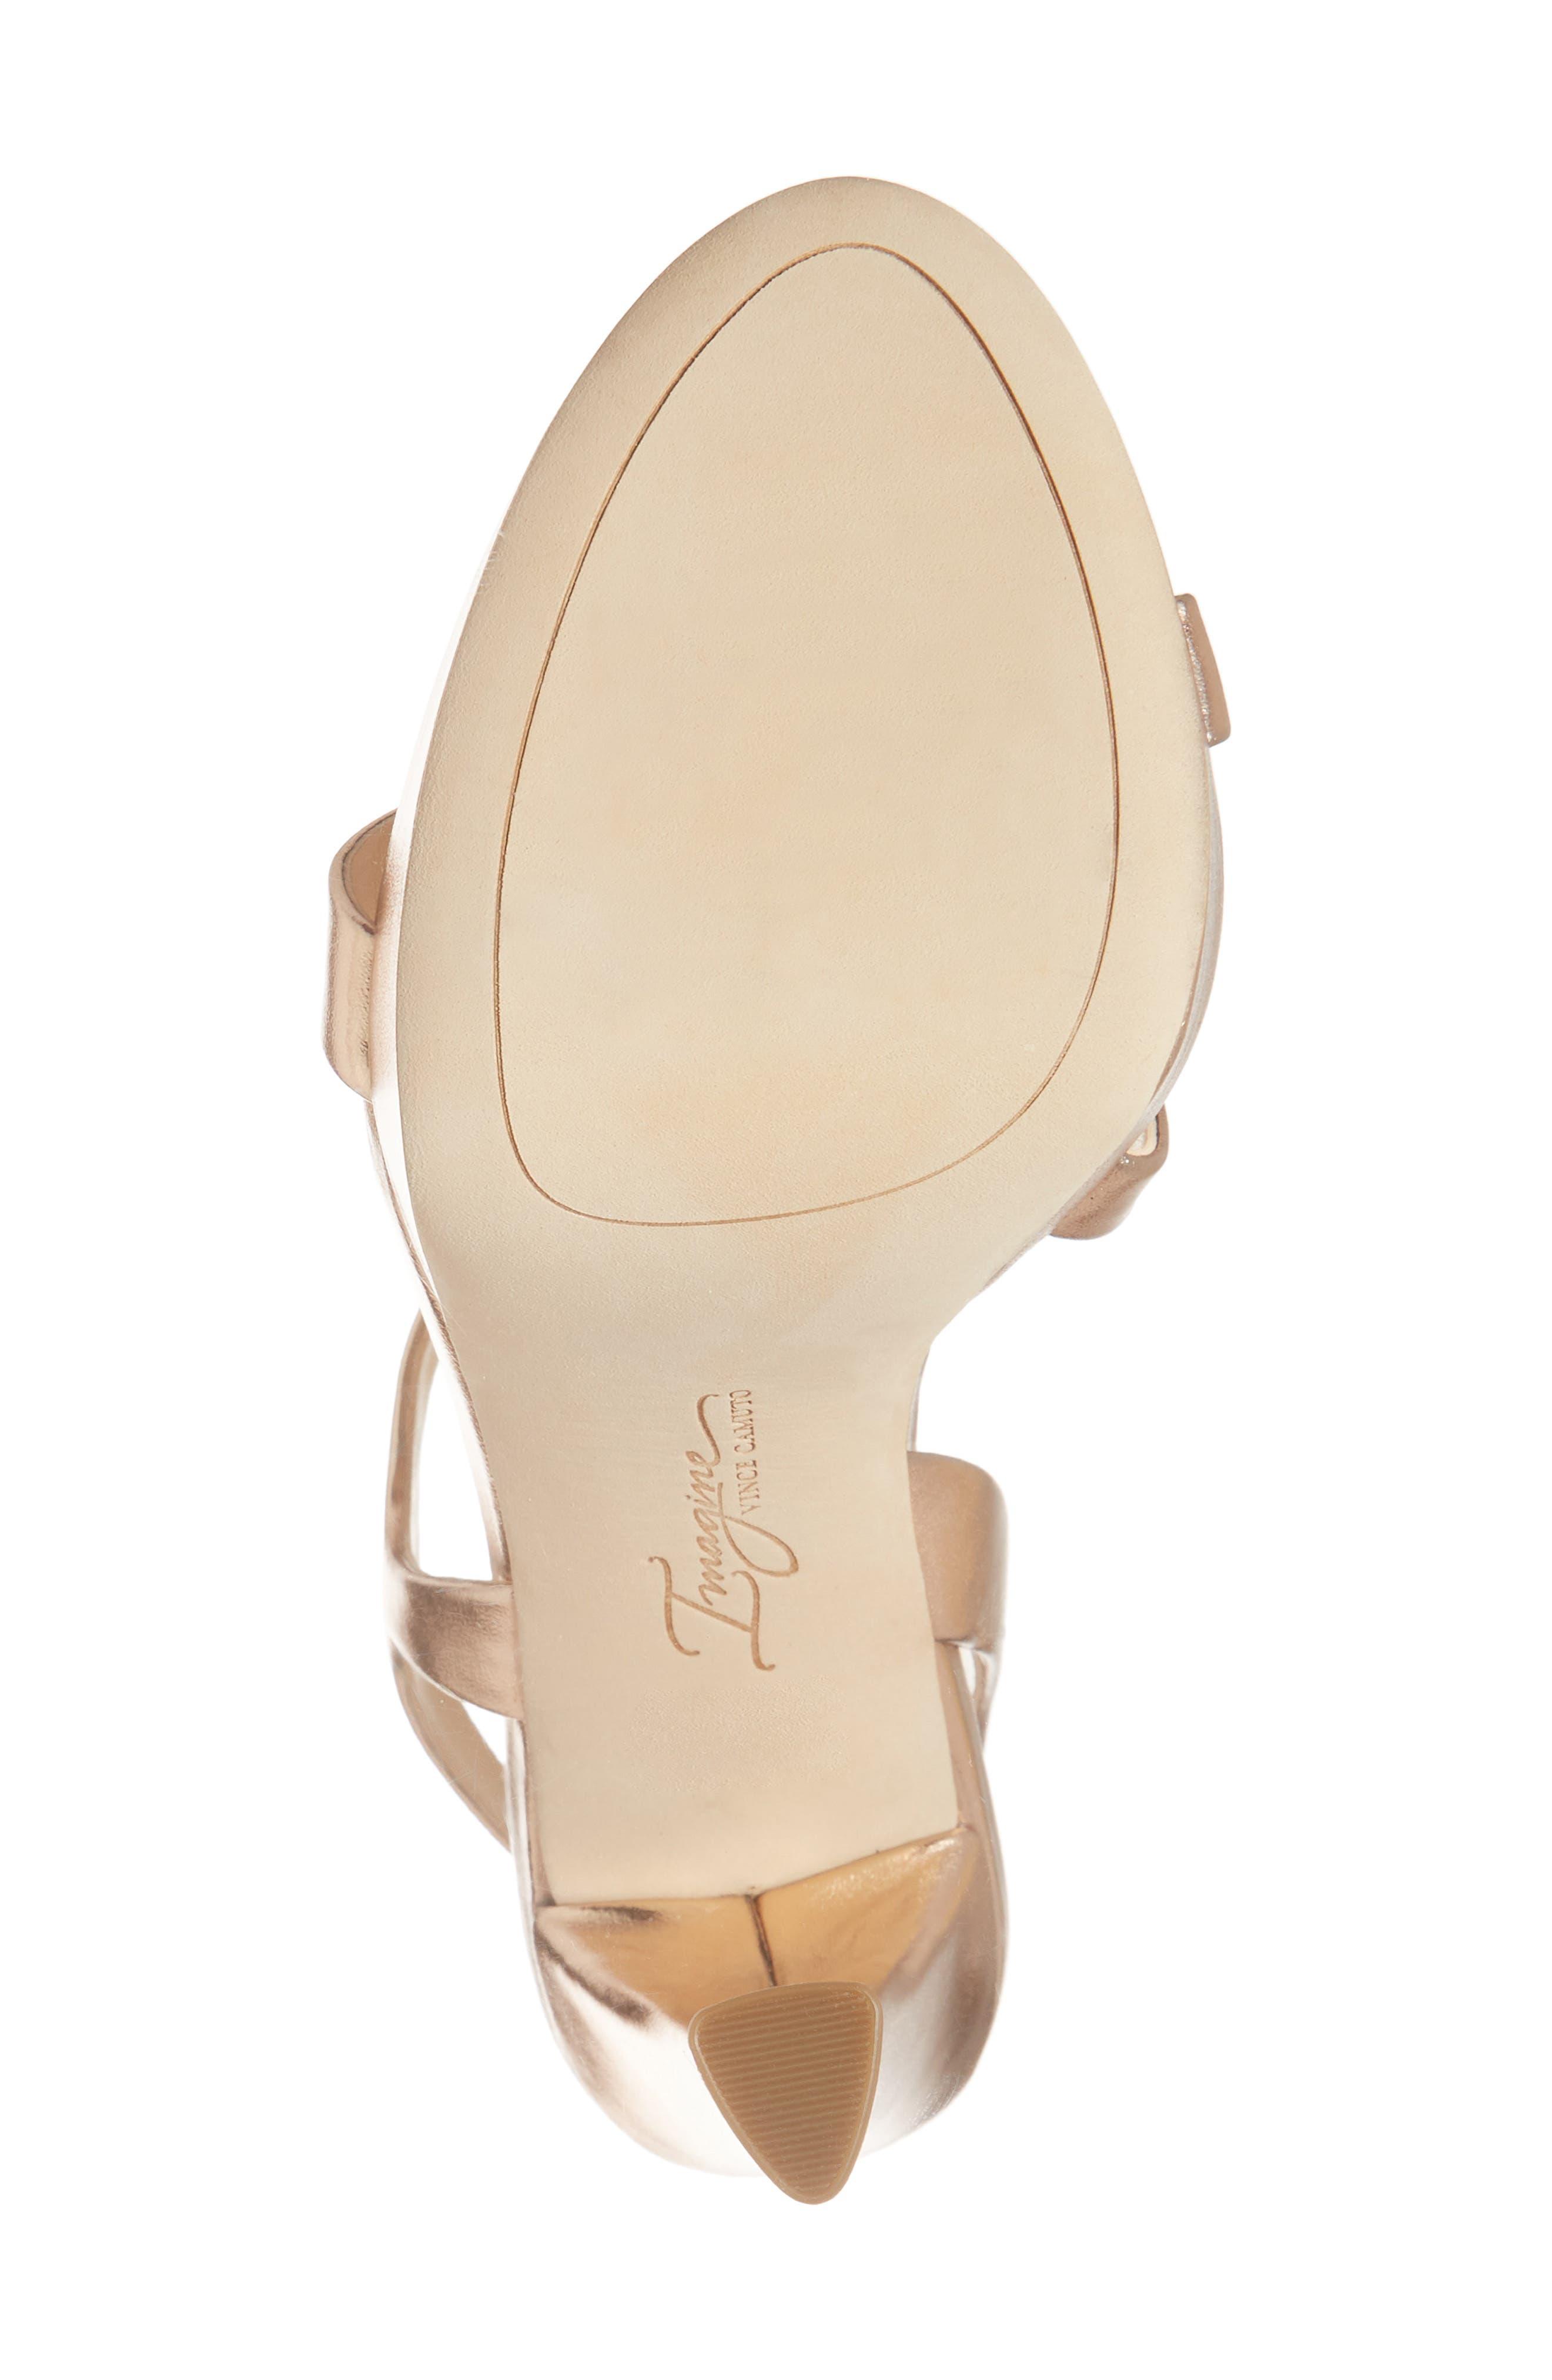 Piera Platform Sandal,                             Alternate thumbnail 6, color,                             ROSE GOLD LEATHER